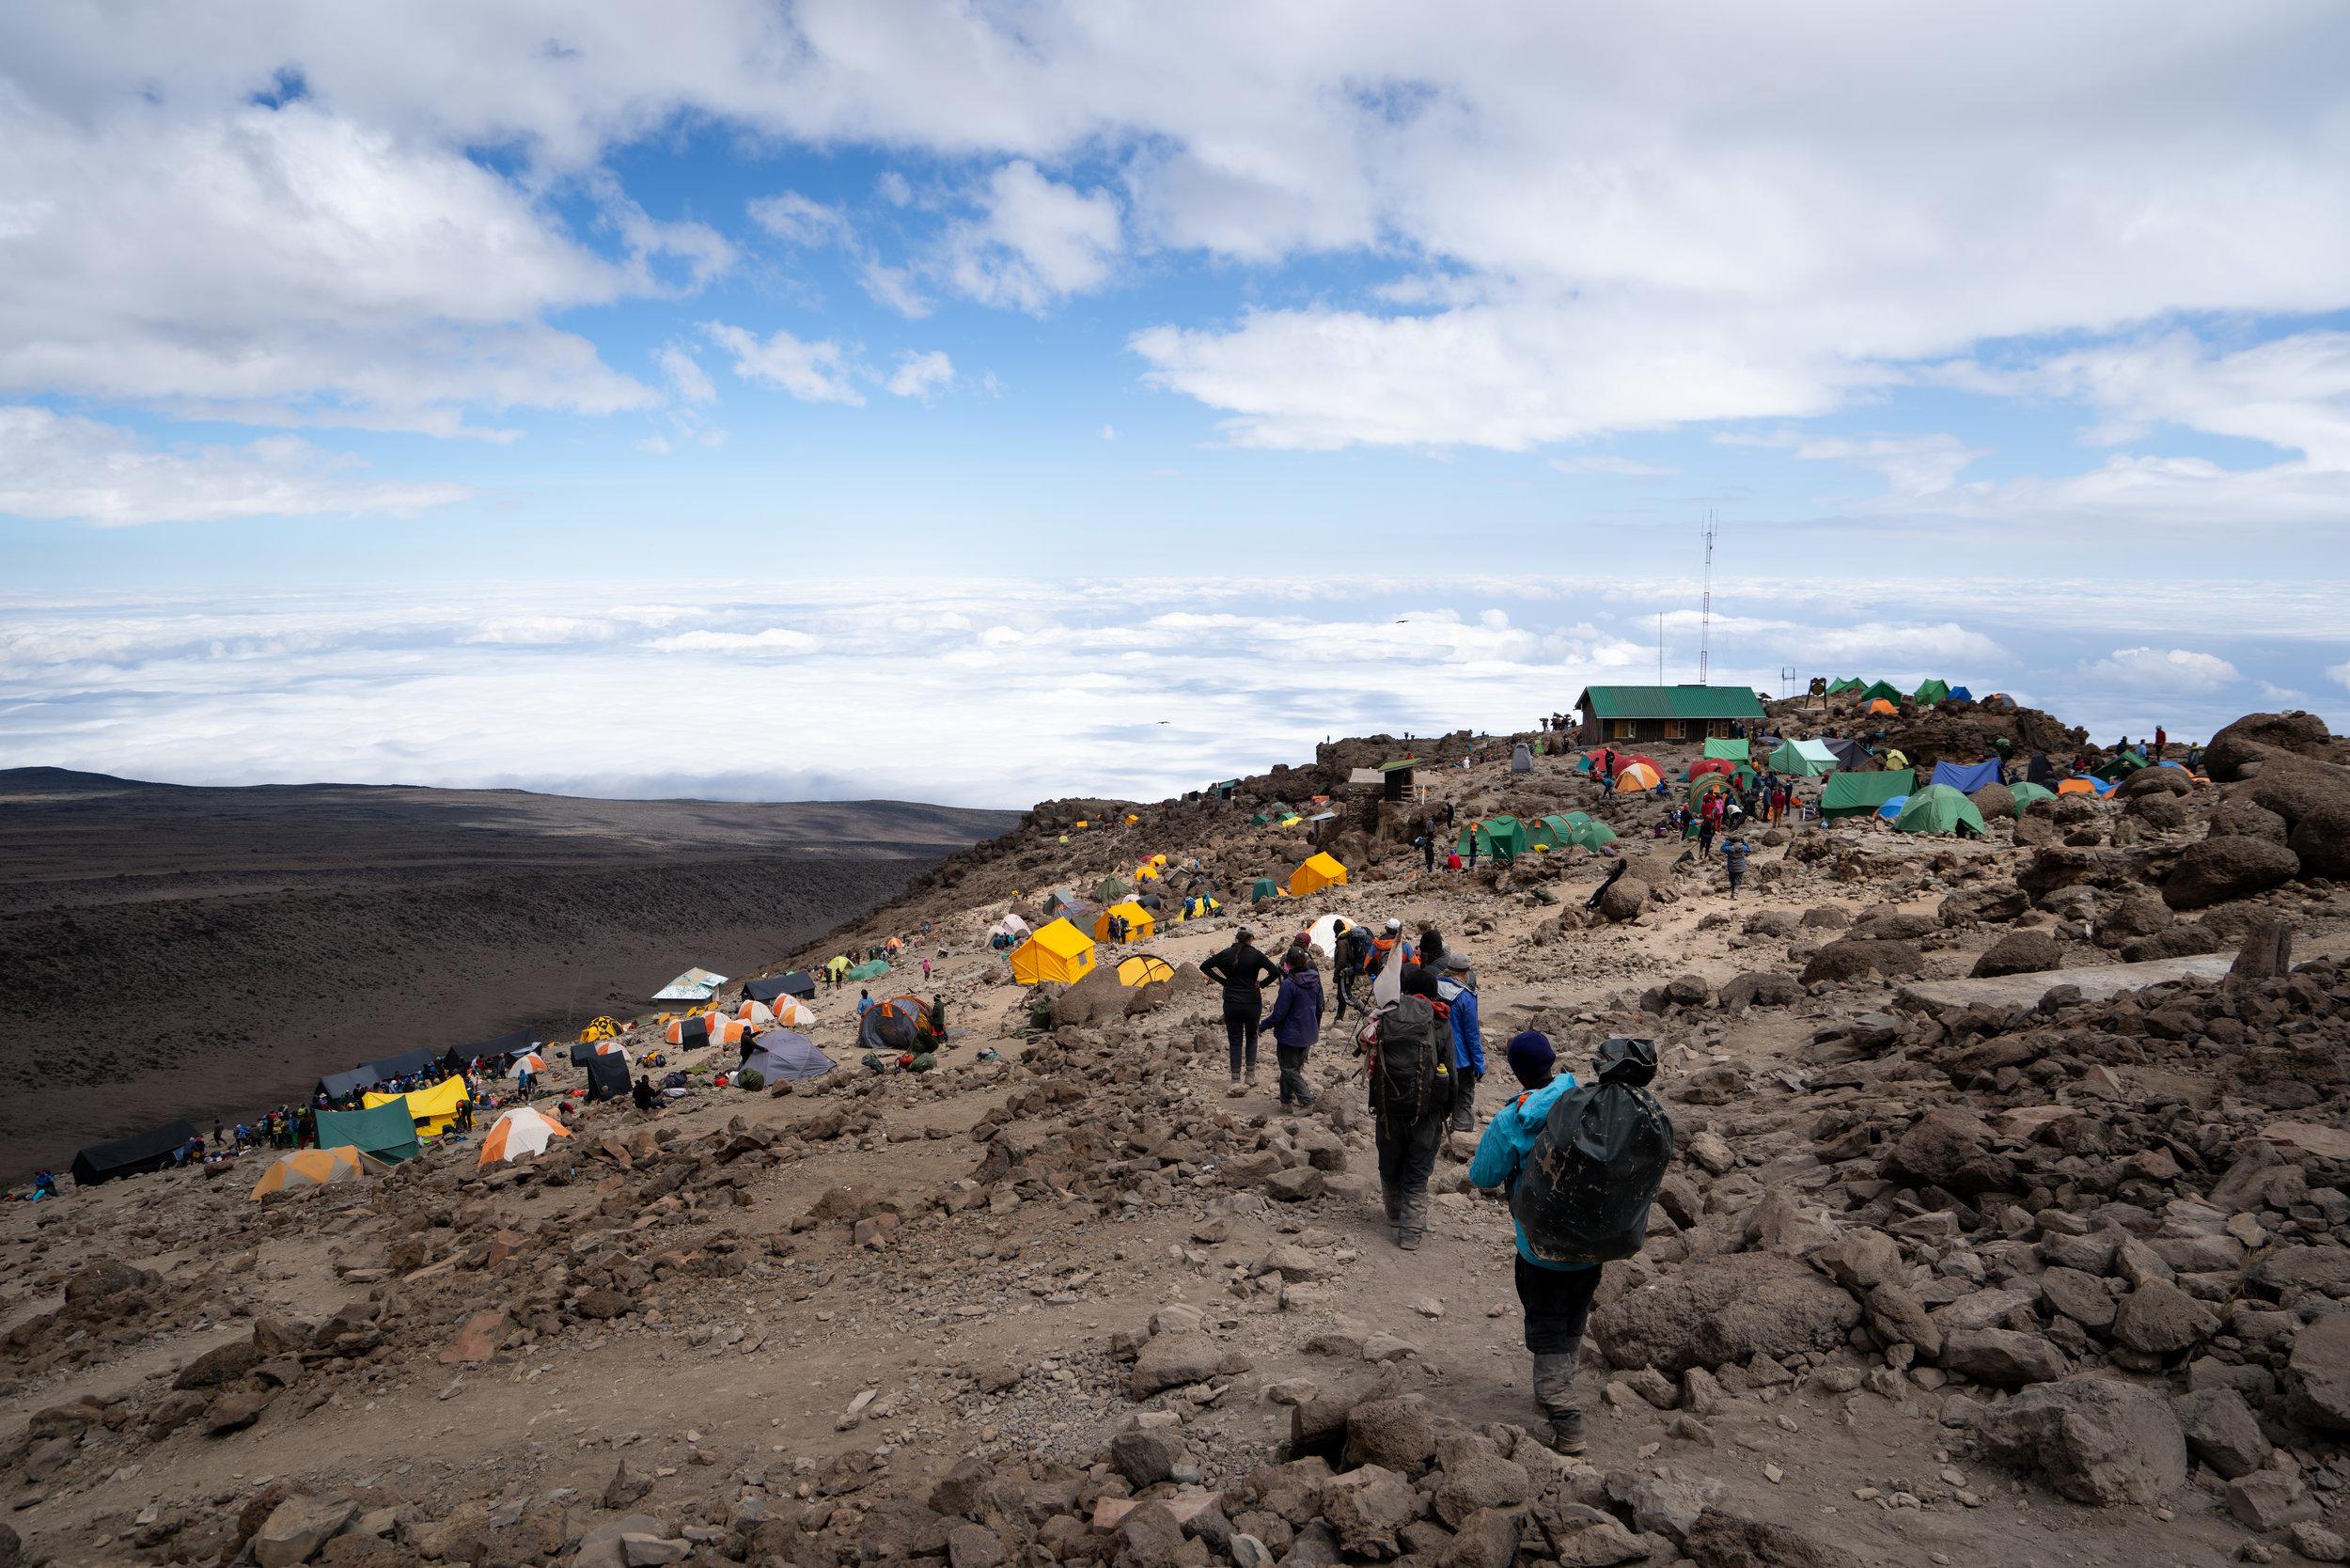 Barafu Camp (15,331 feet)